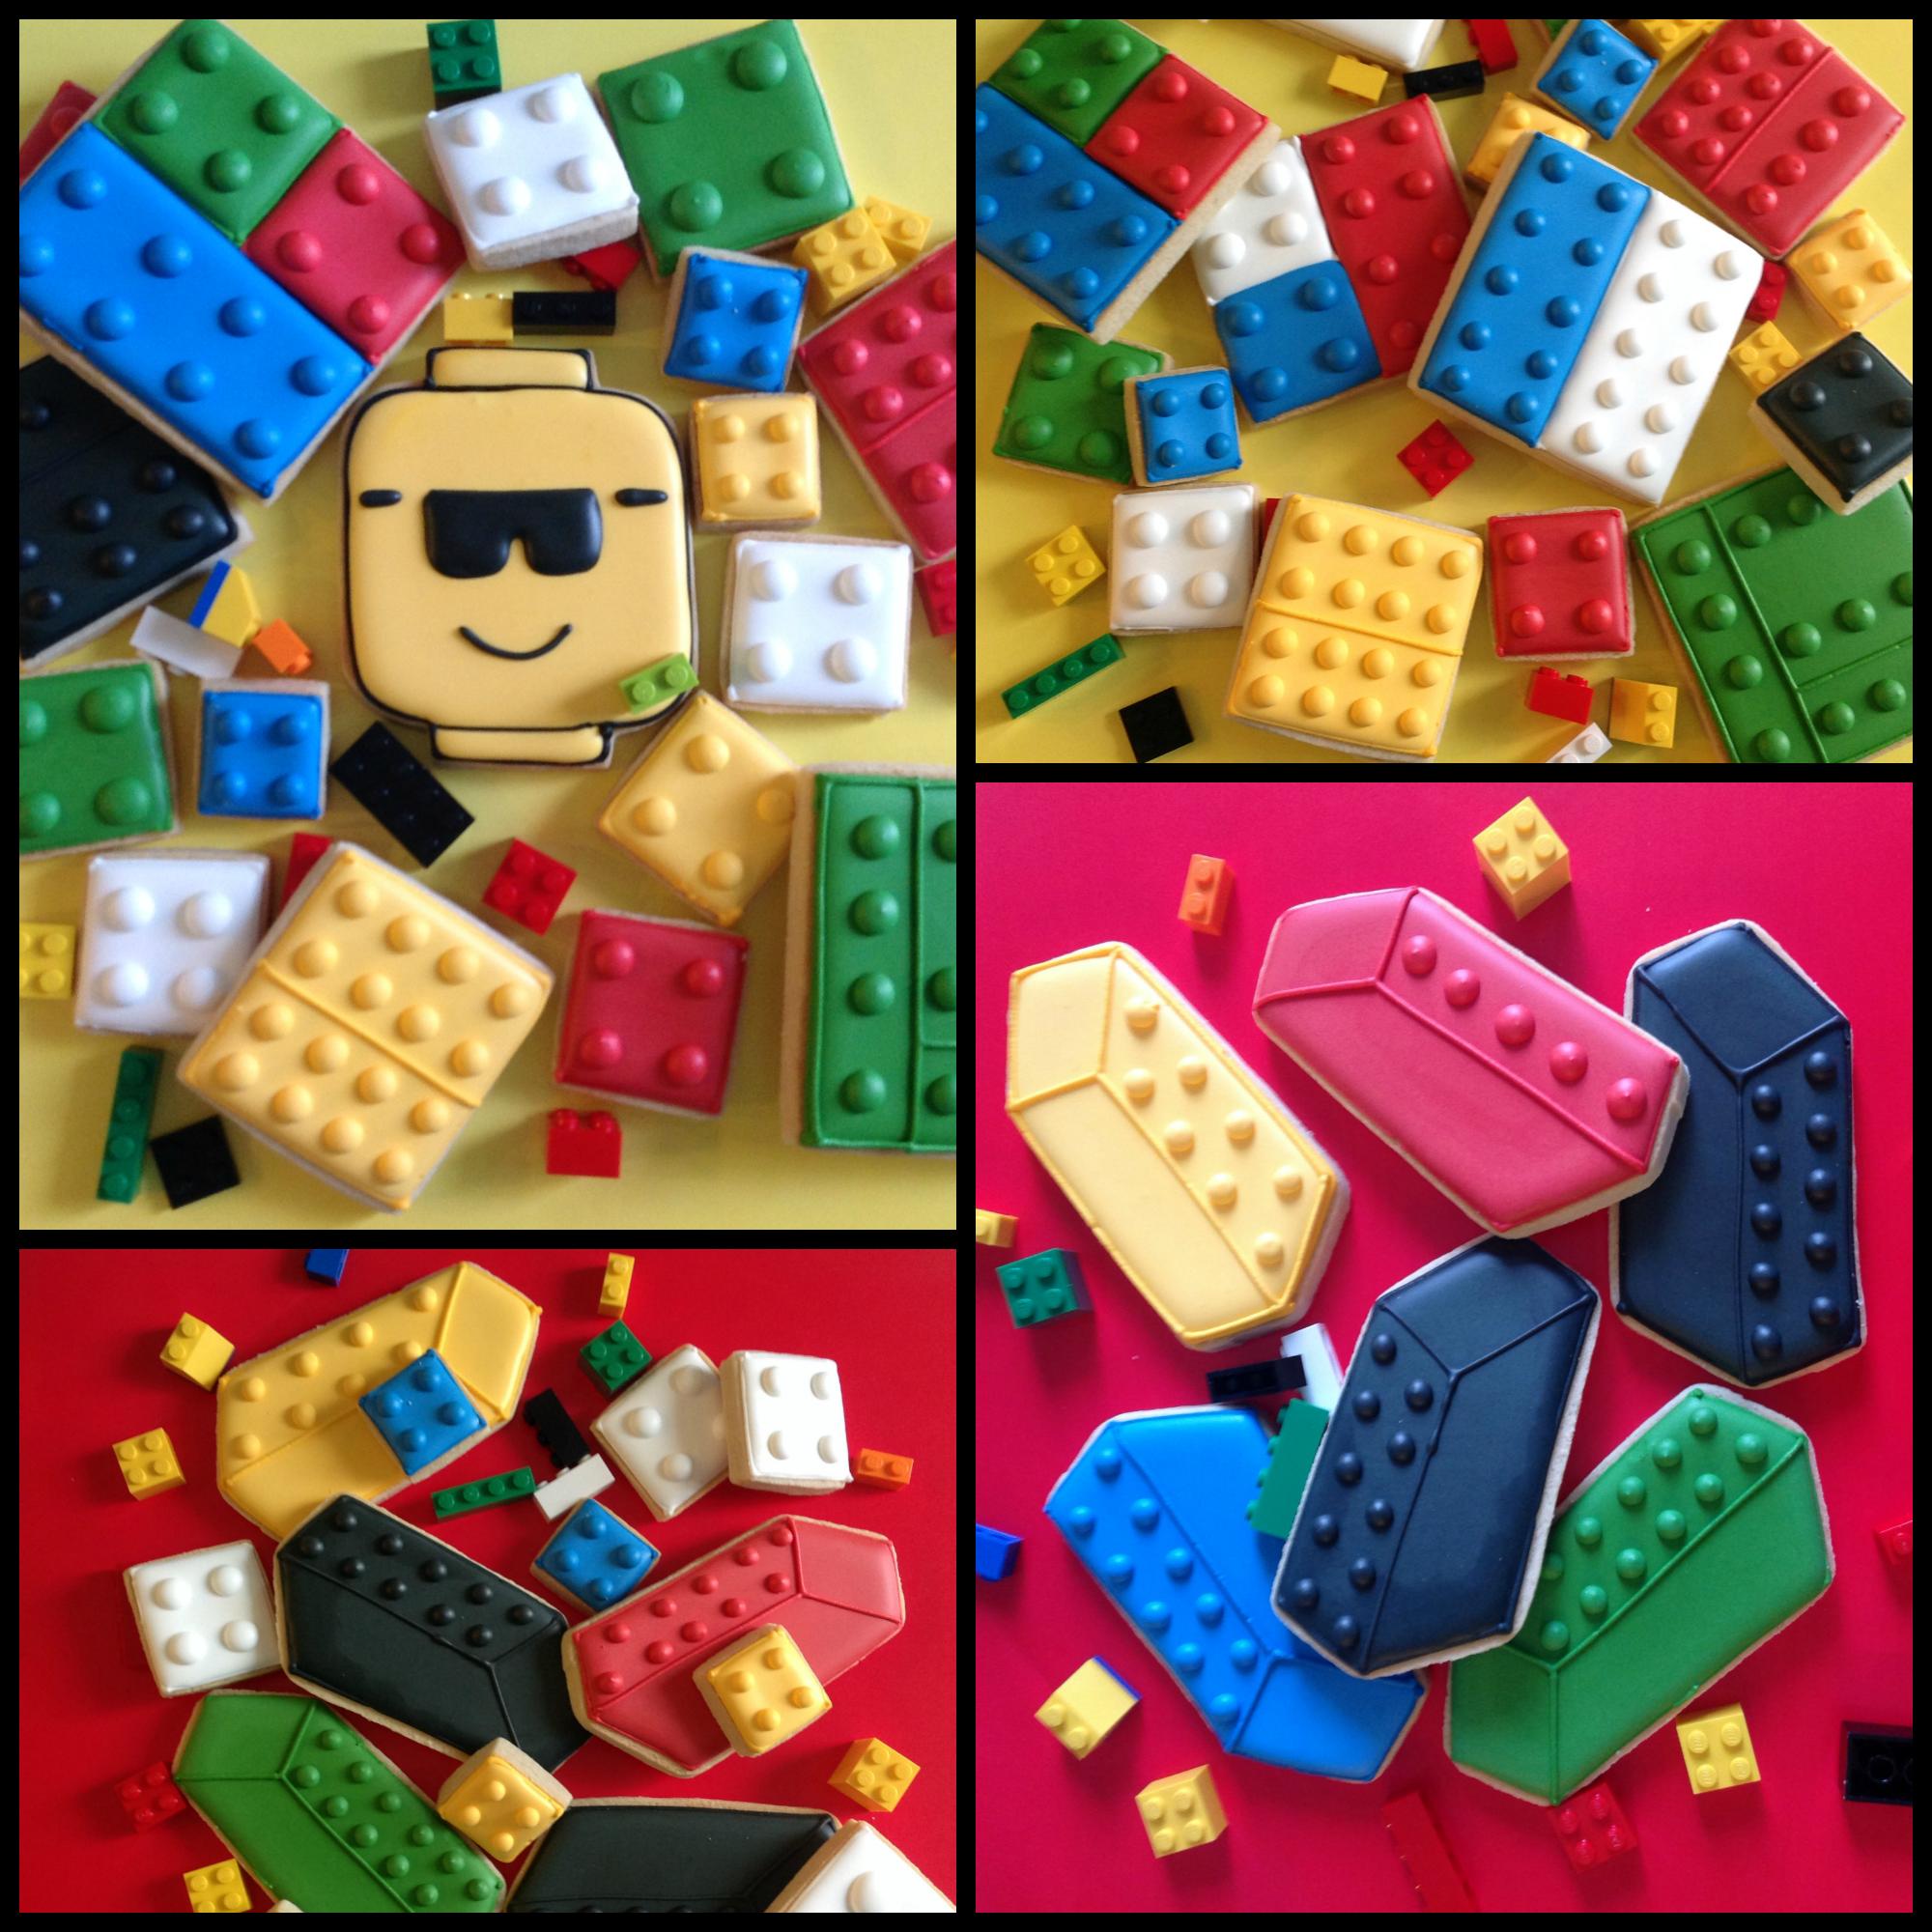 lego-blocks2-collage